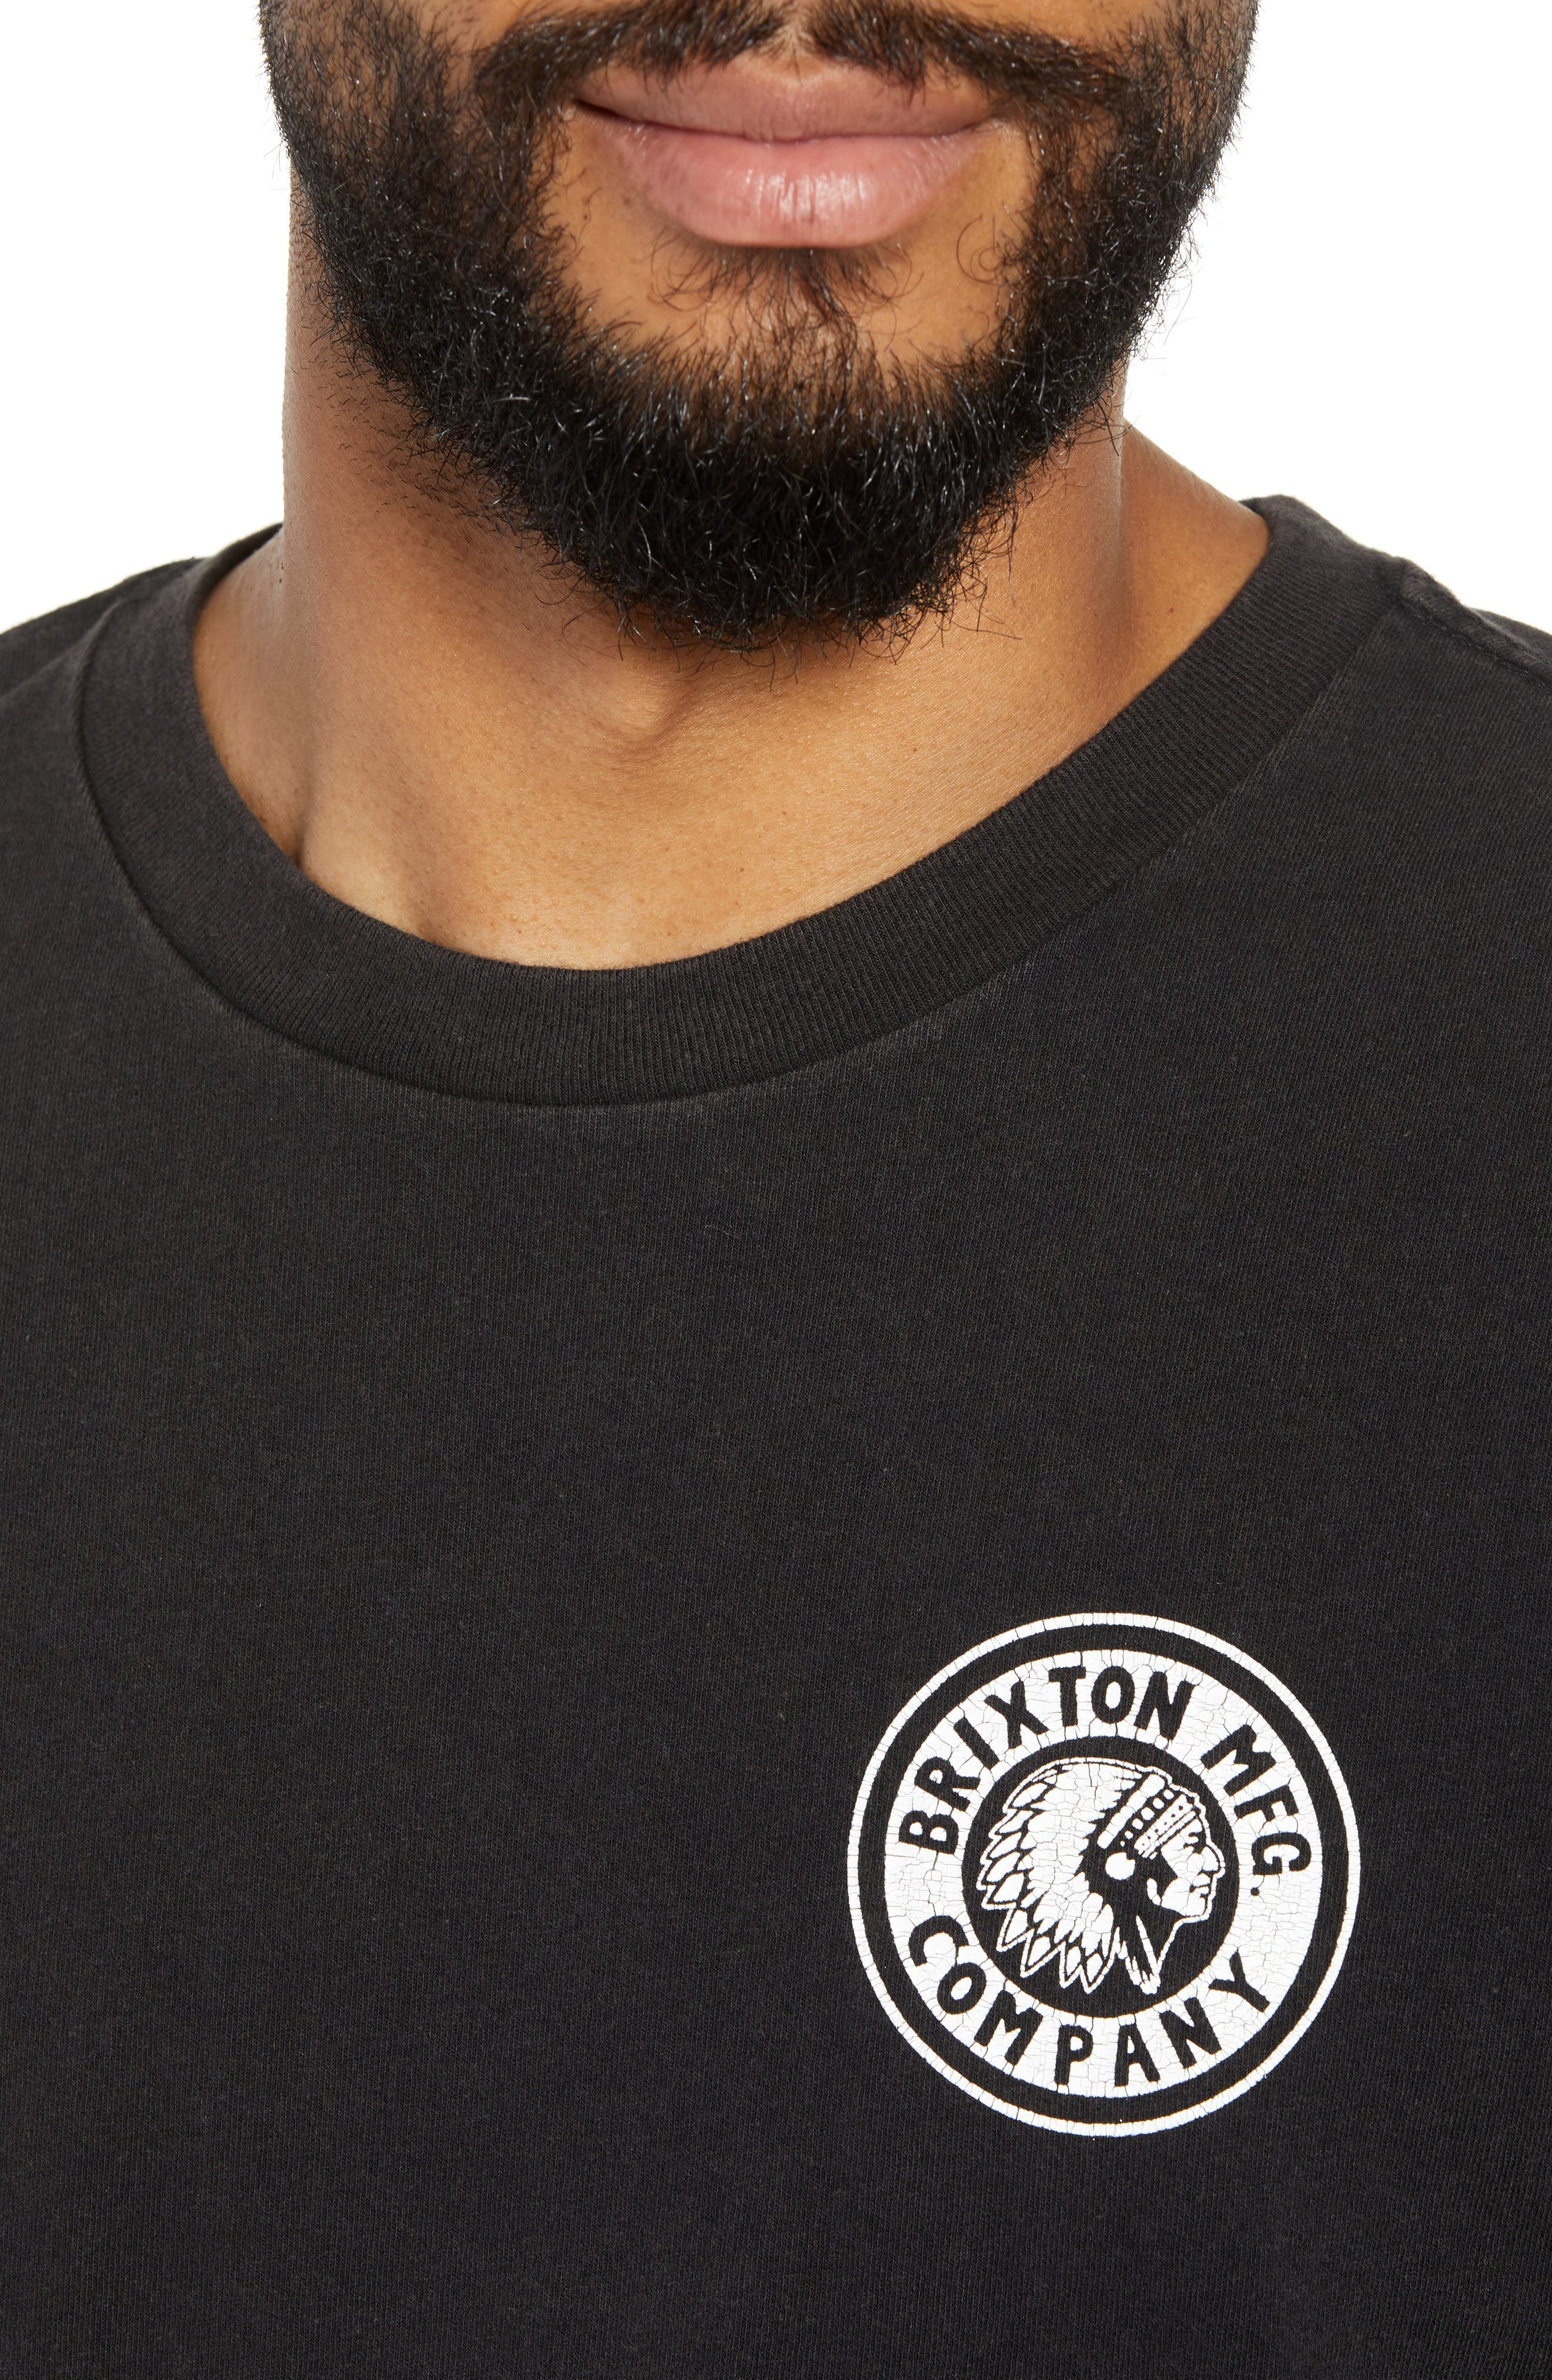 Rival II Graphic T-Shirt,                             Alternate thumbnail 3, color,                             Black/ White/ White